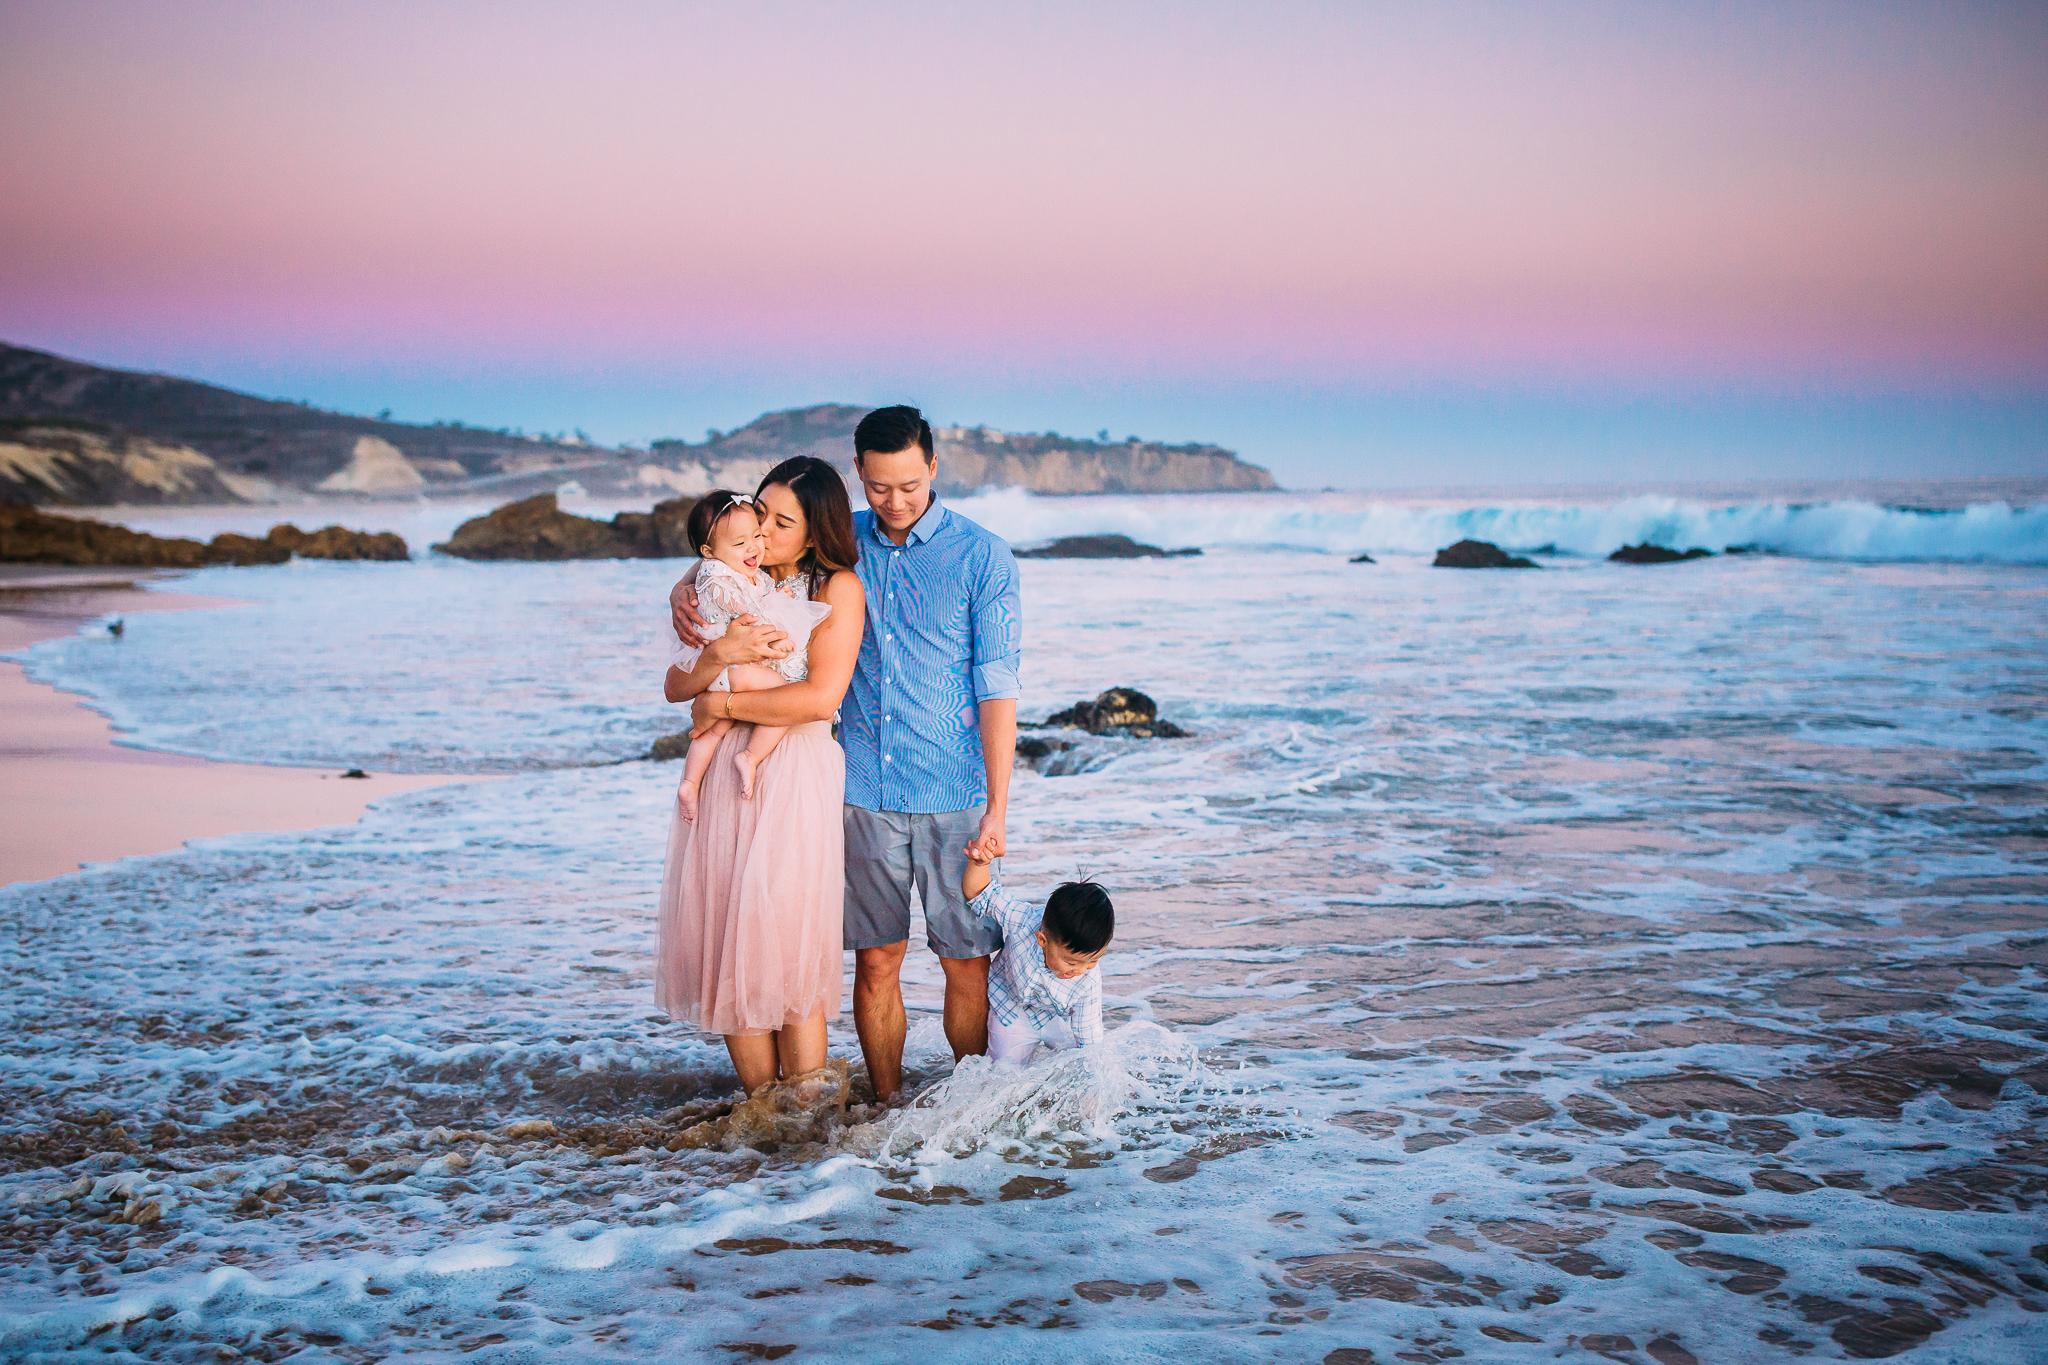 newportbeachfamilyphotographer-7.jpg